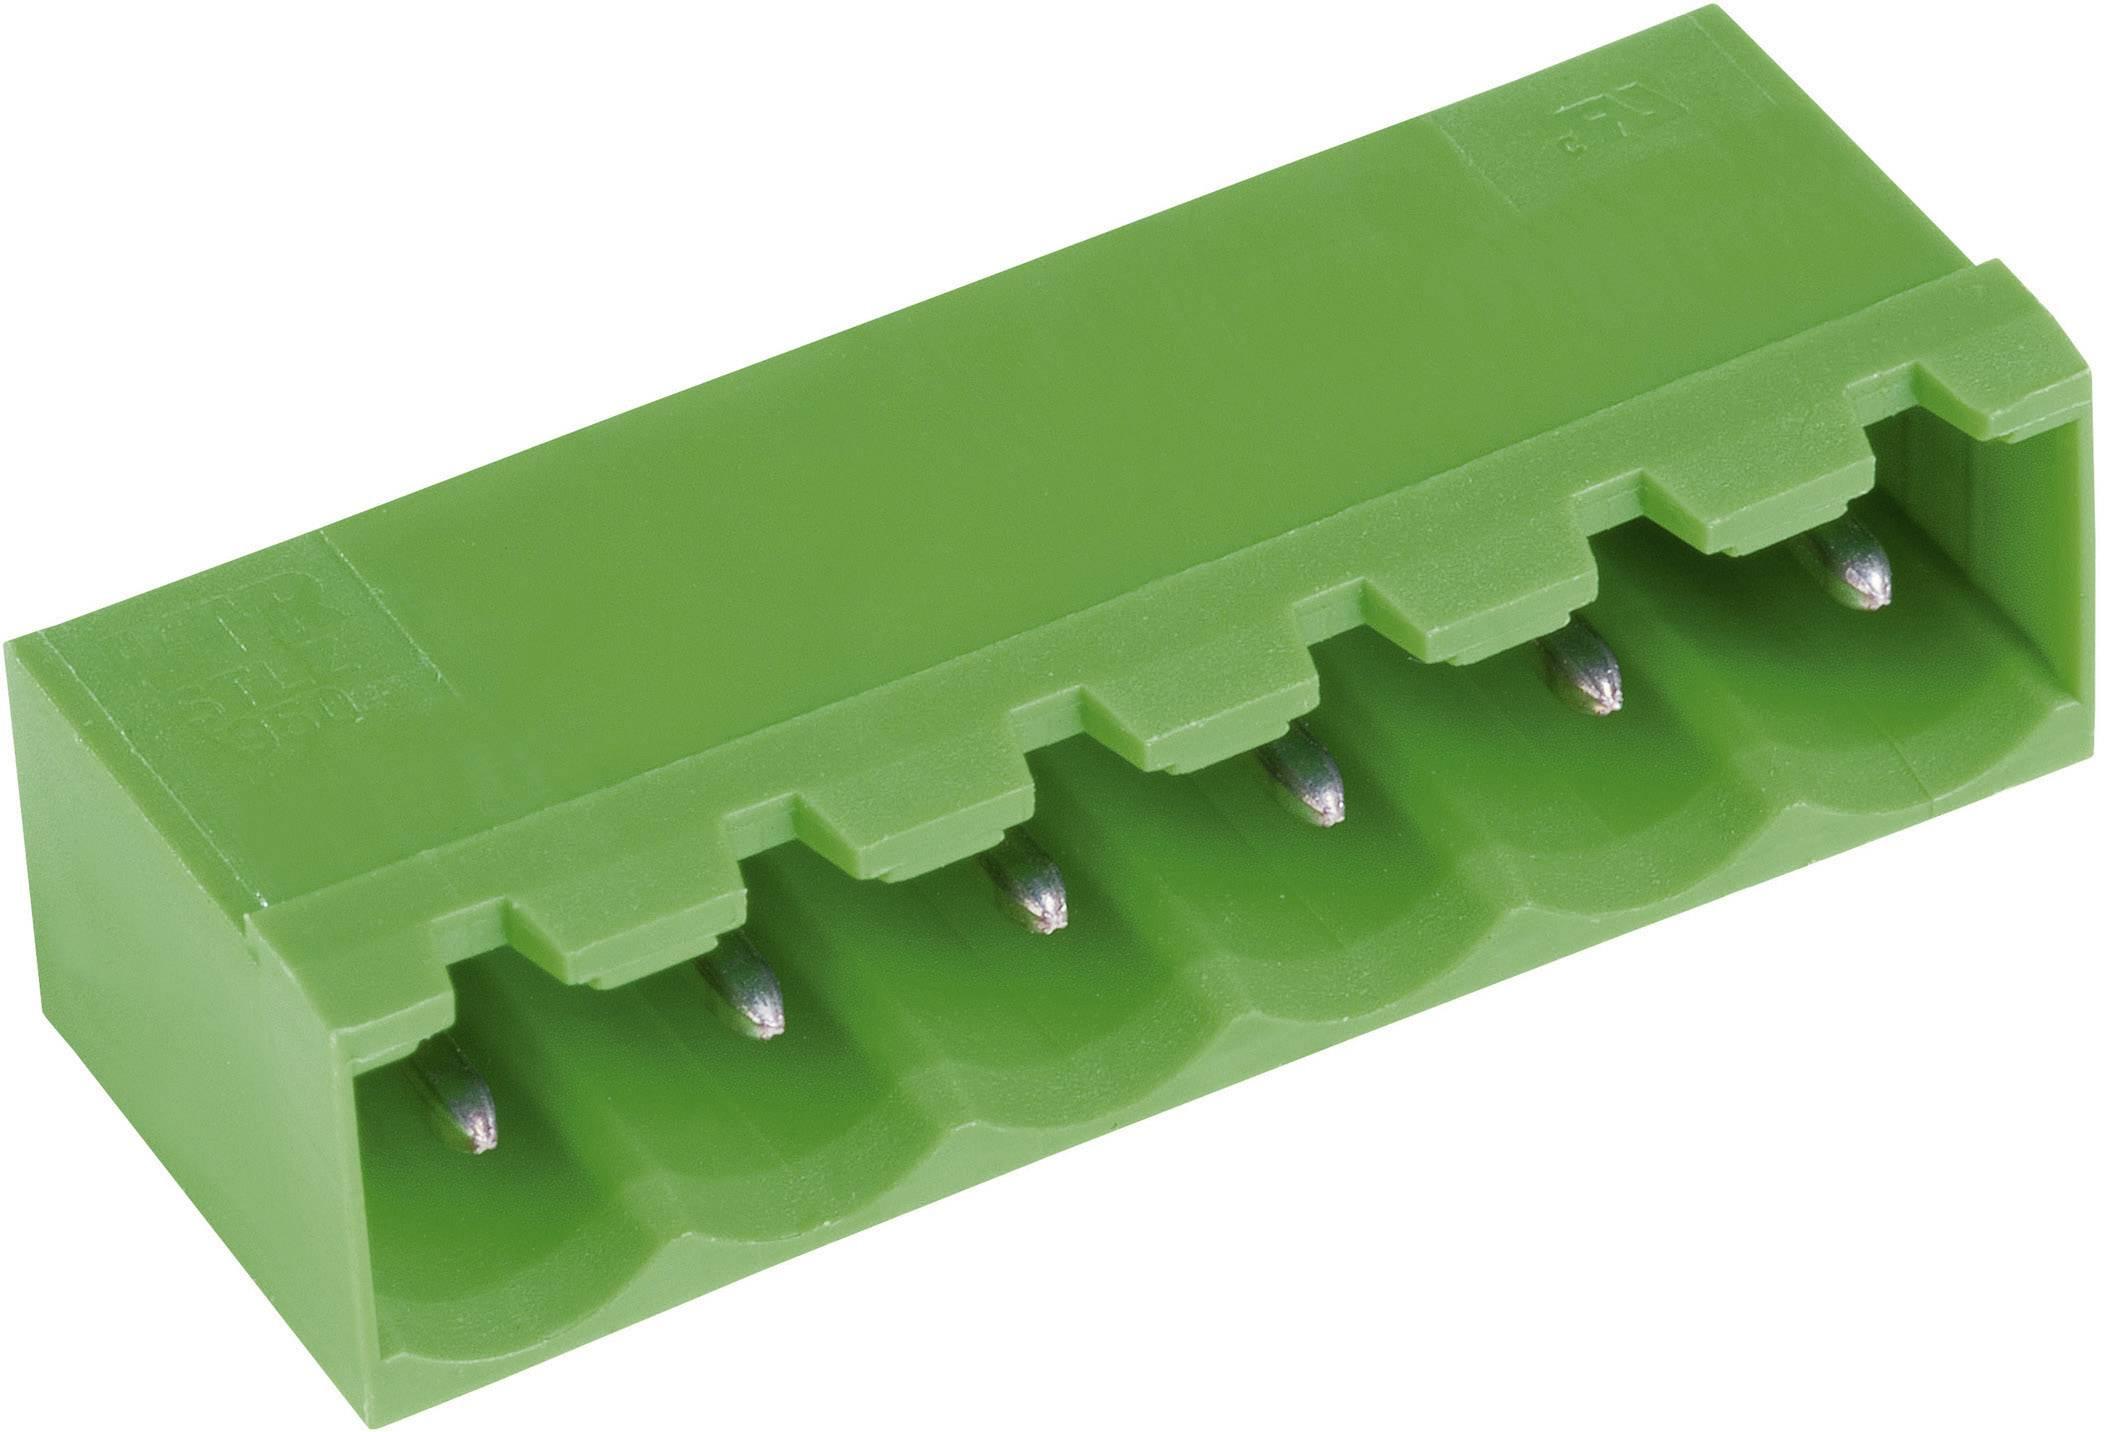 Konektor do DPS PTR STL950/12G-5.0-H 50950125001D, 61.20 mm, pólů 12, rozteč 5 mm, 1 ks